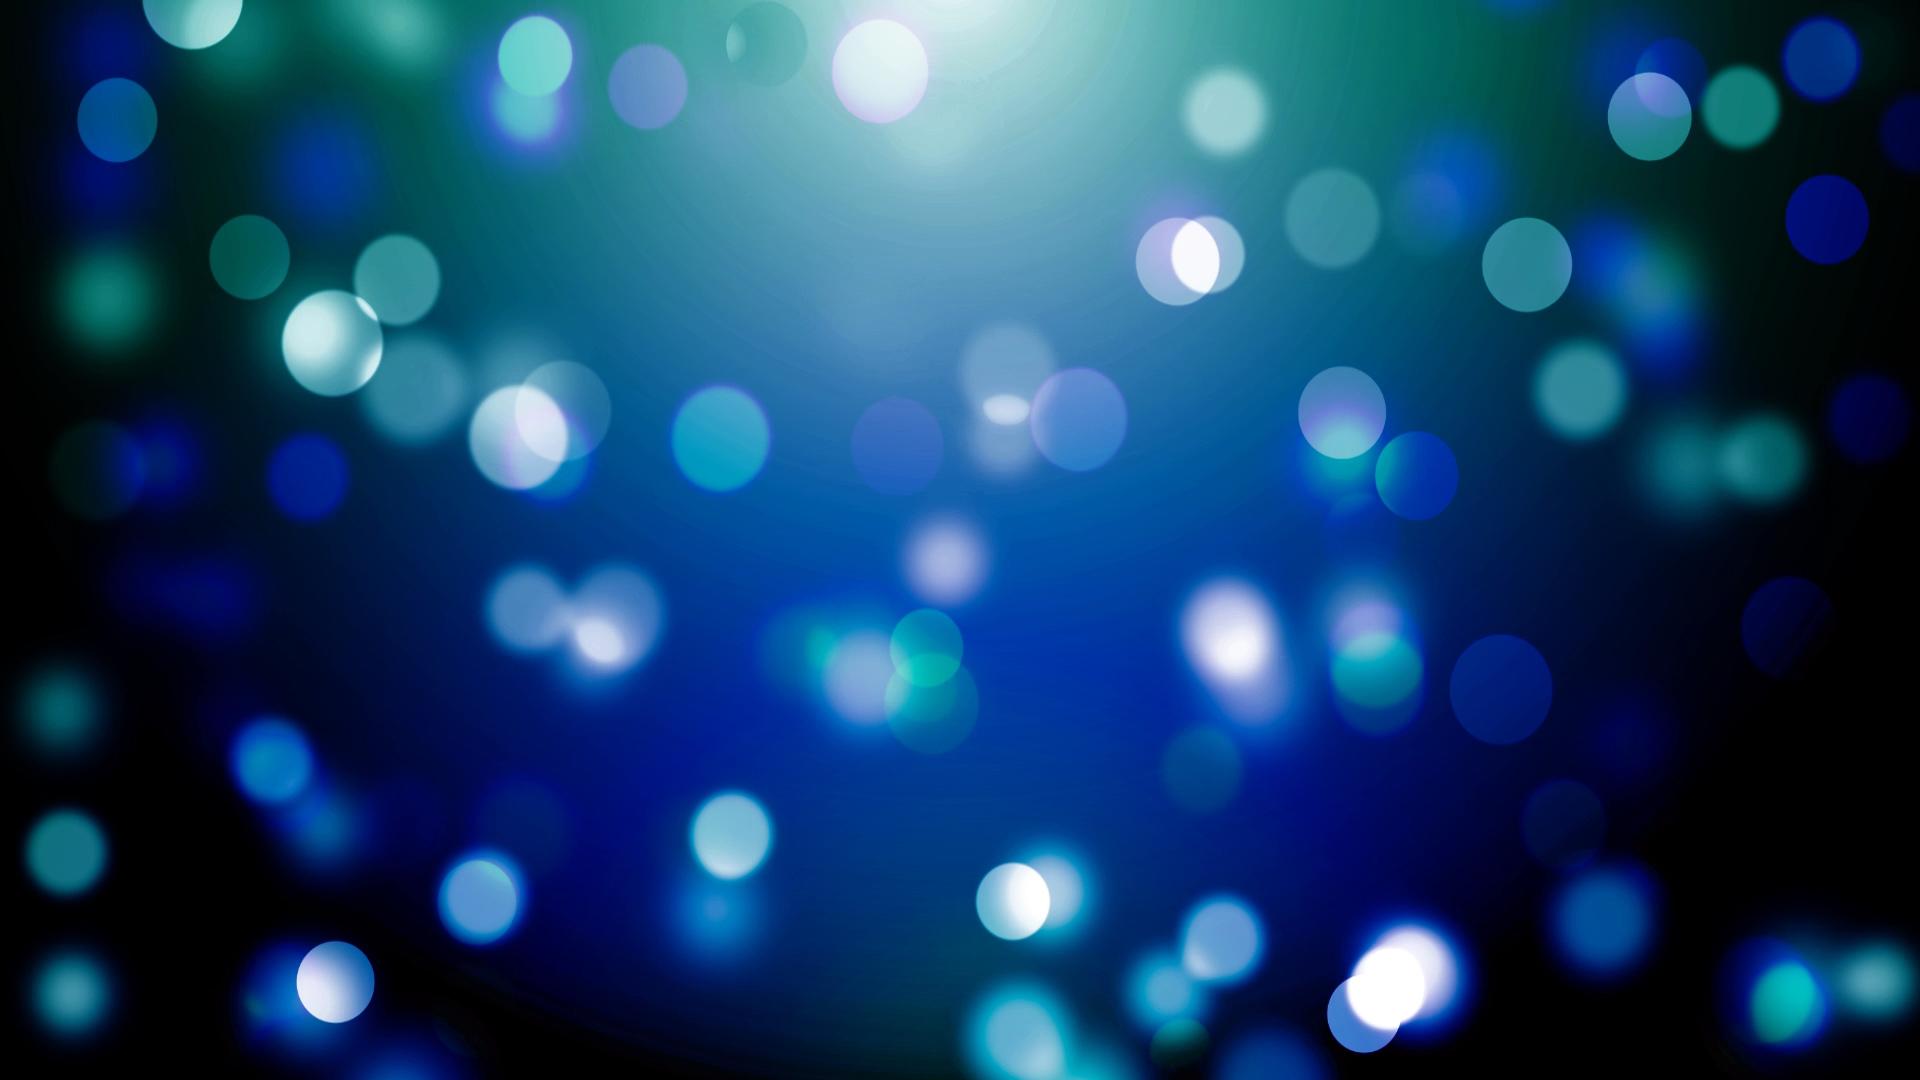 Light Effect Hd Wallpaper Background Images: Free Photo: Blue Bokeh Blur